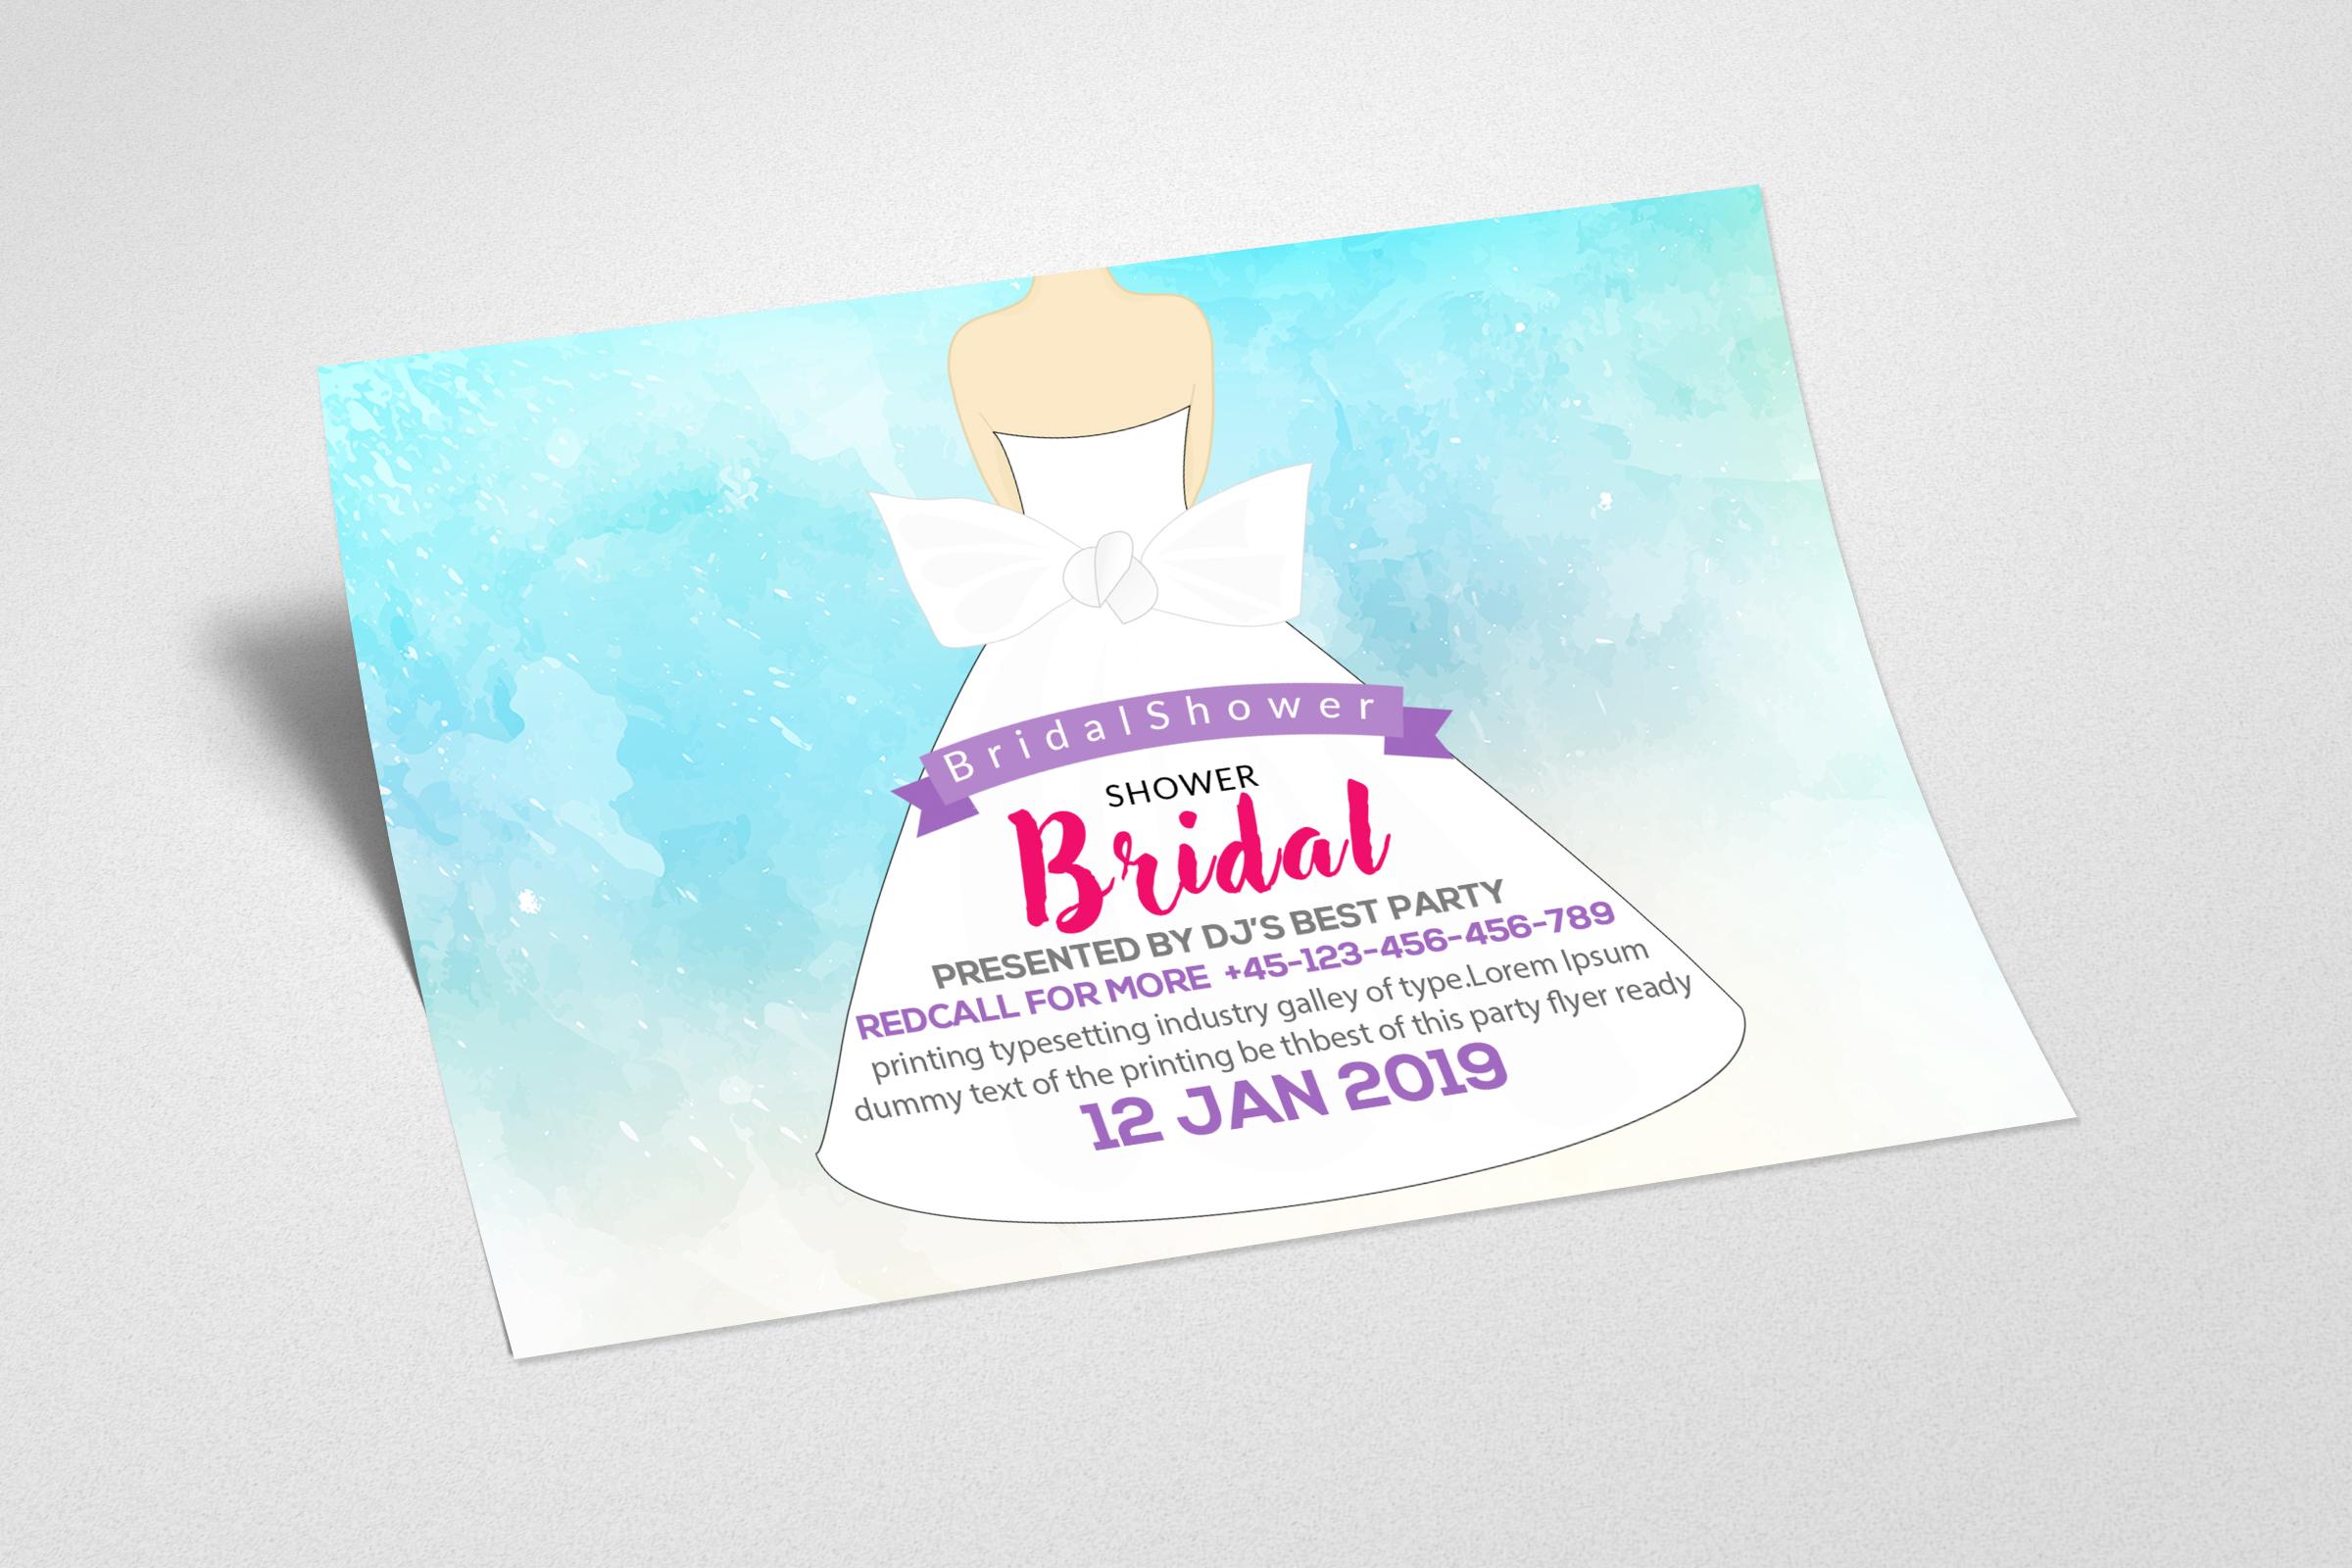 Bridal Shower Invitation Card example image 2